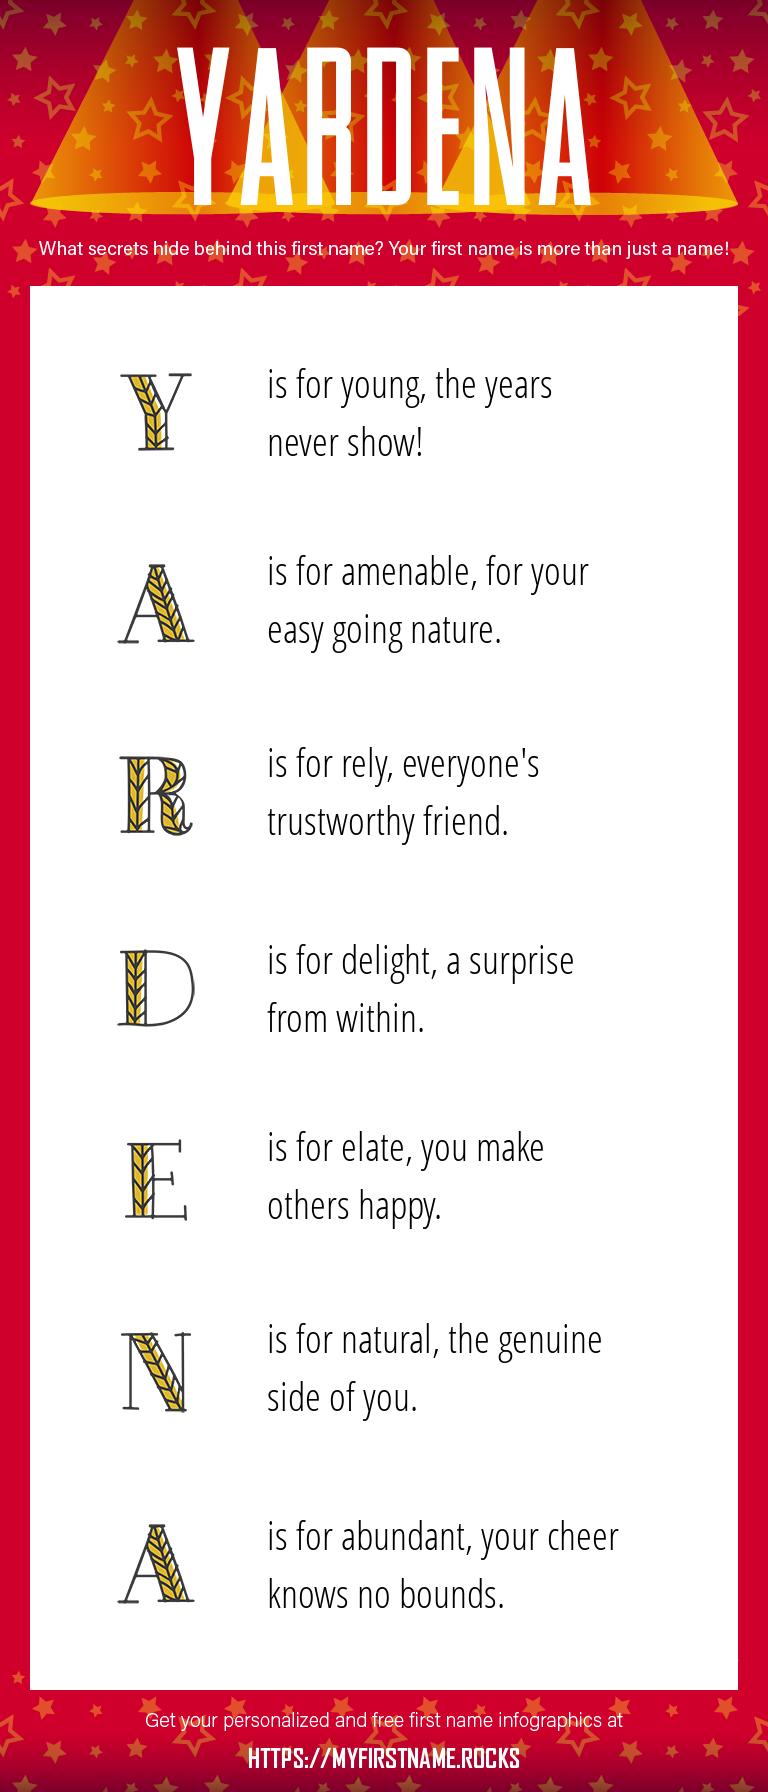 Yardena Infographics